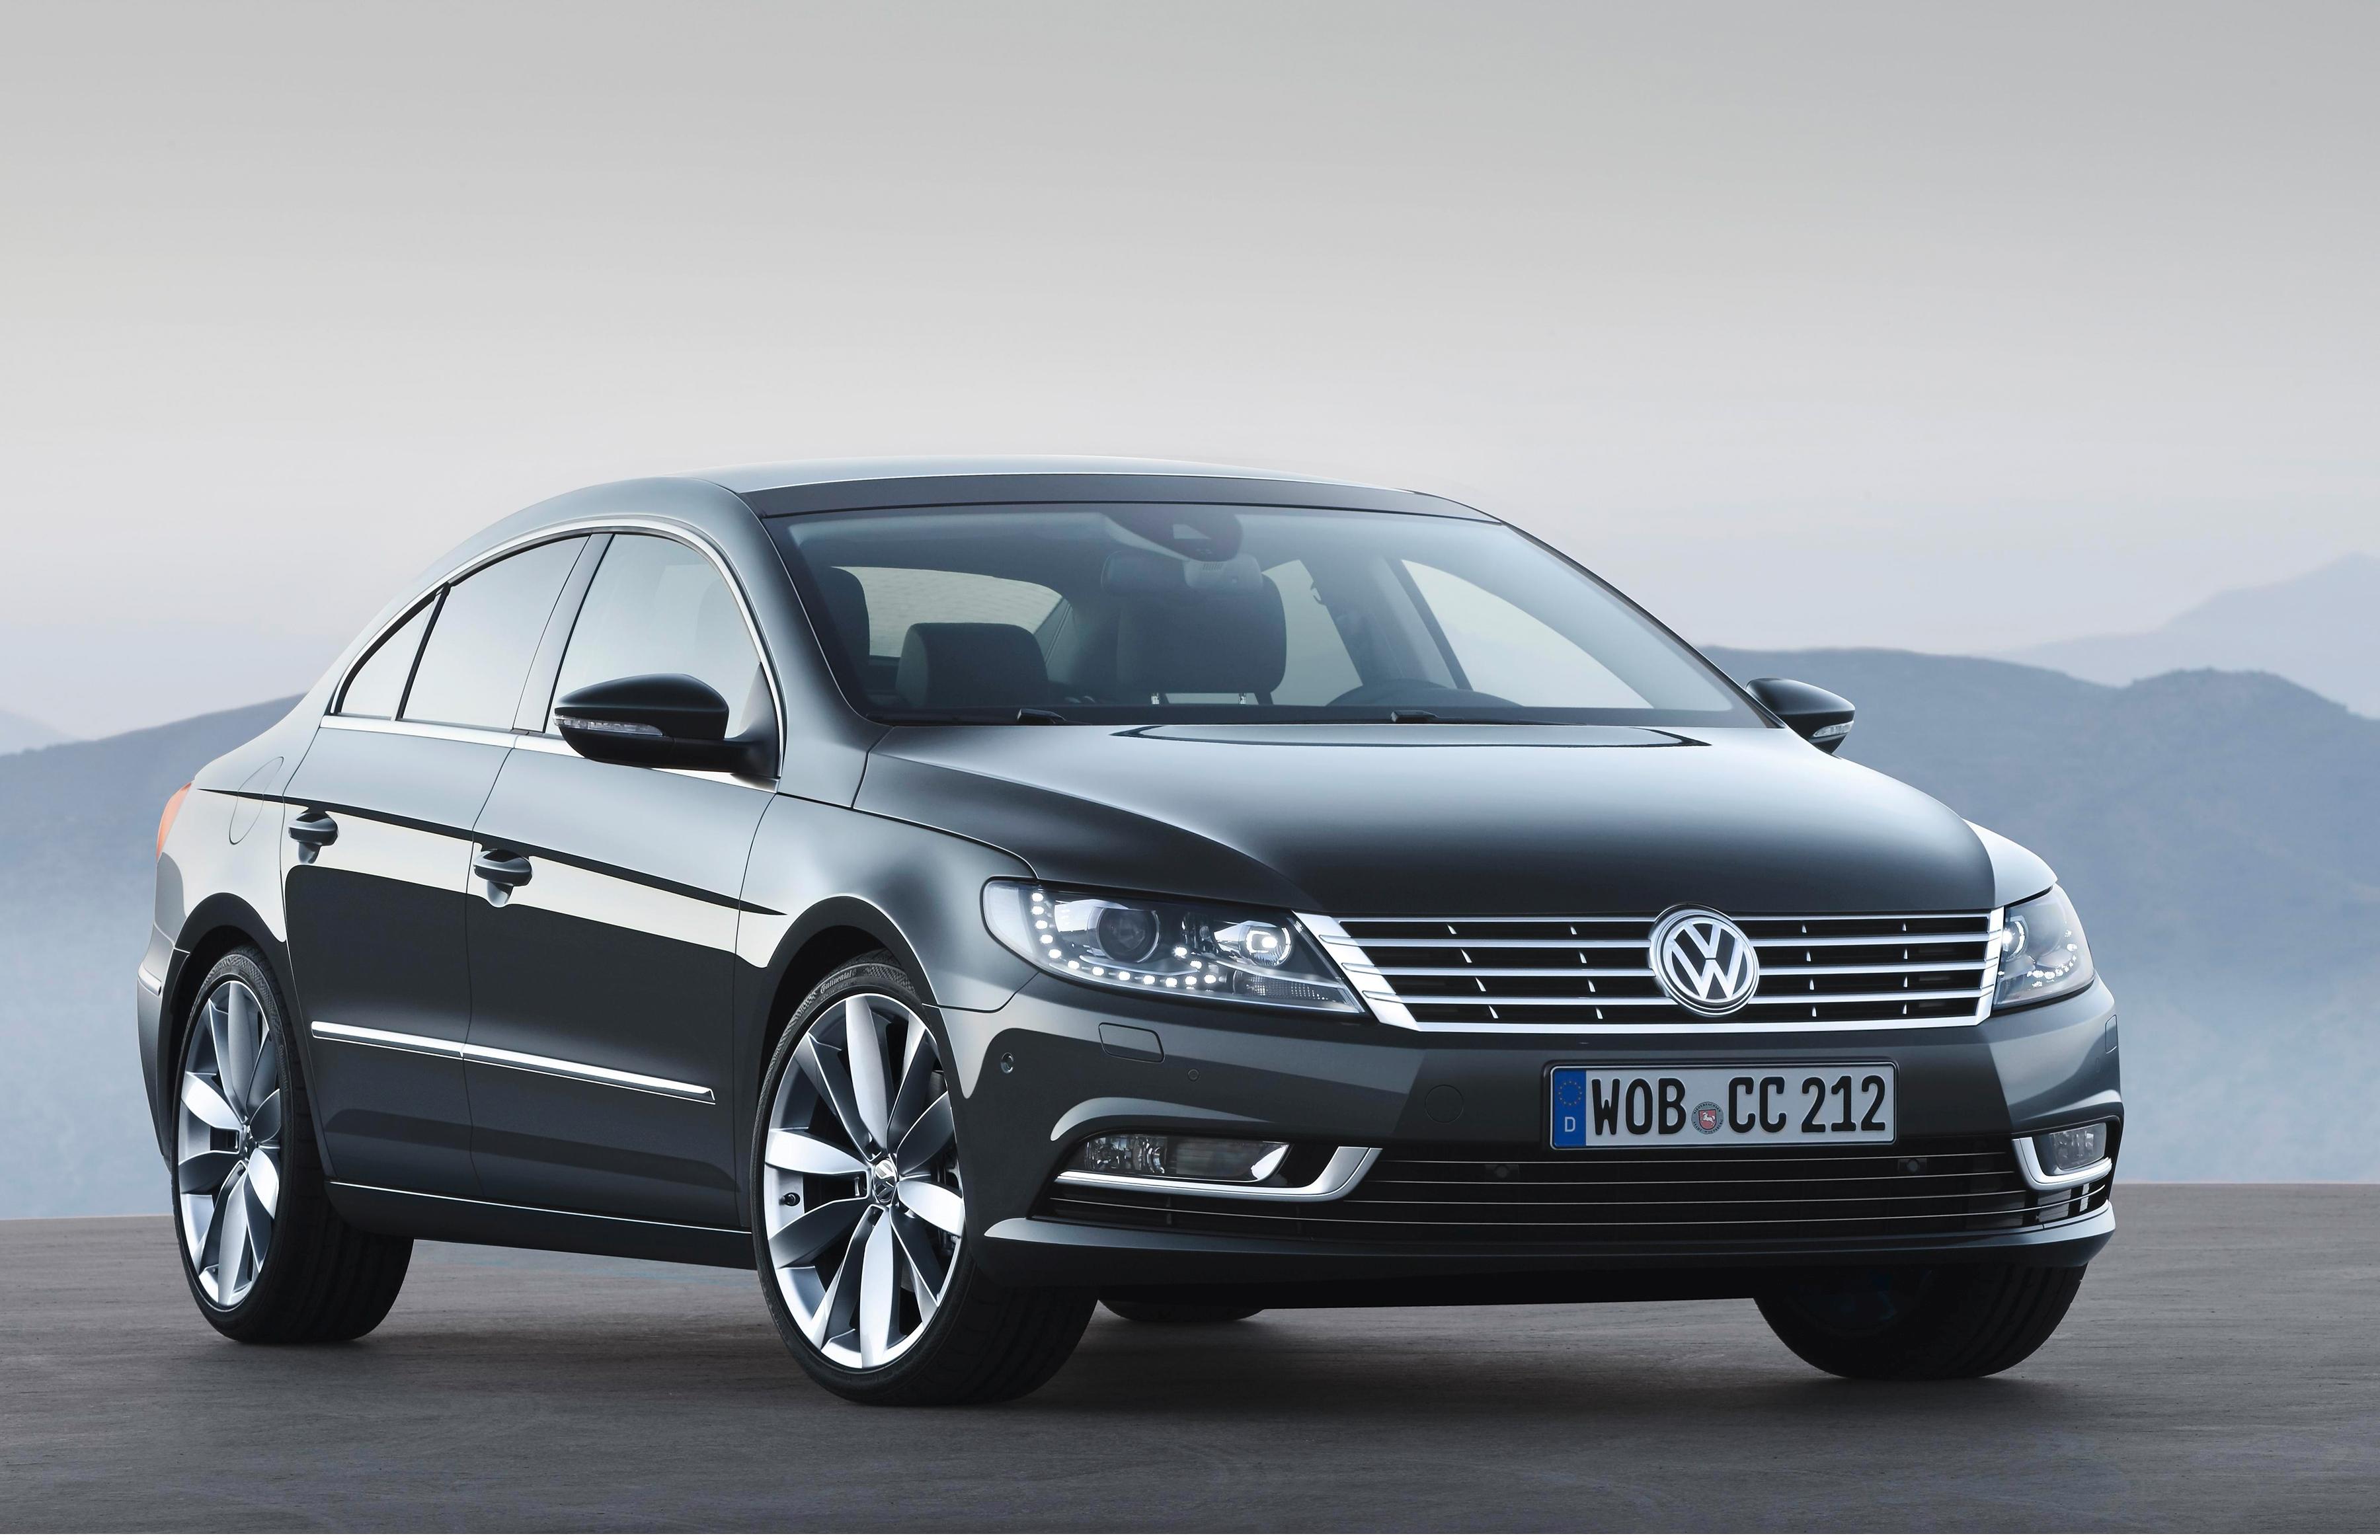 VW CC (358)